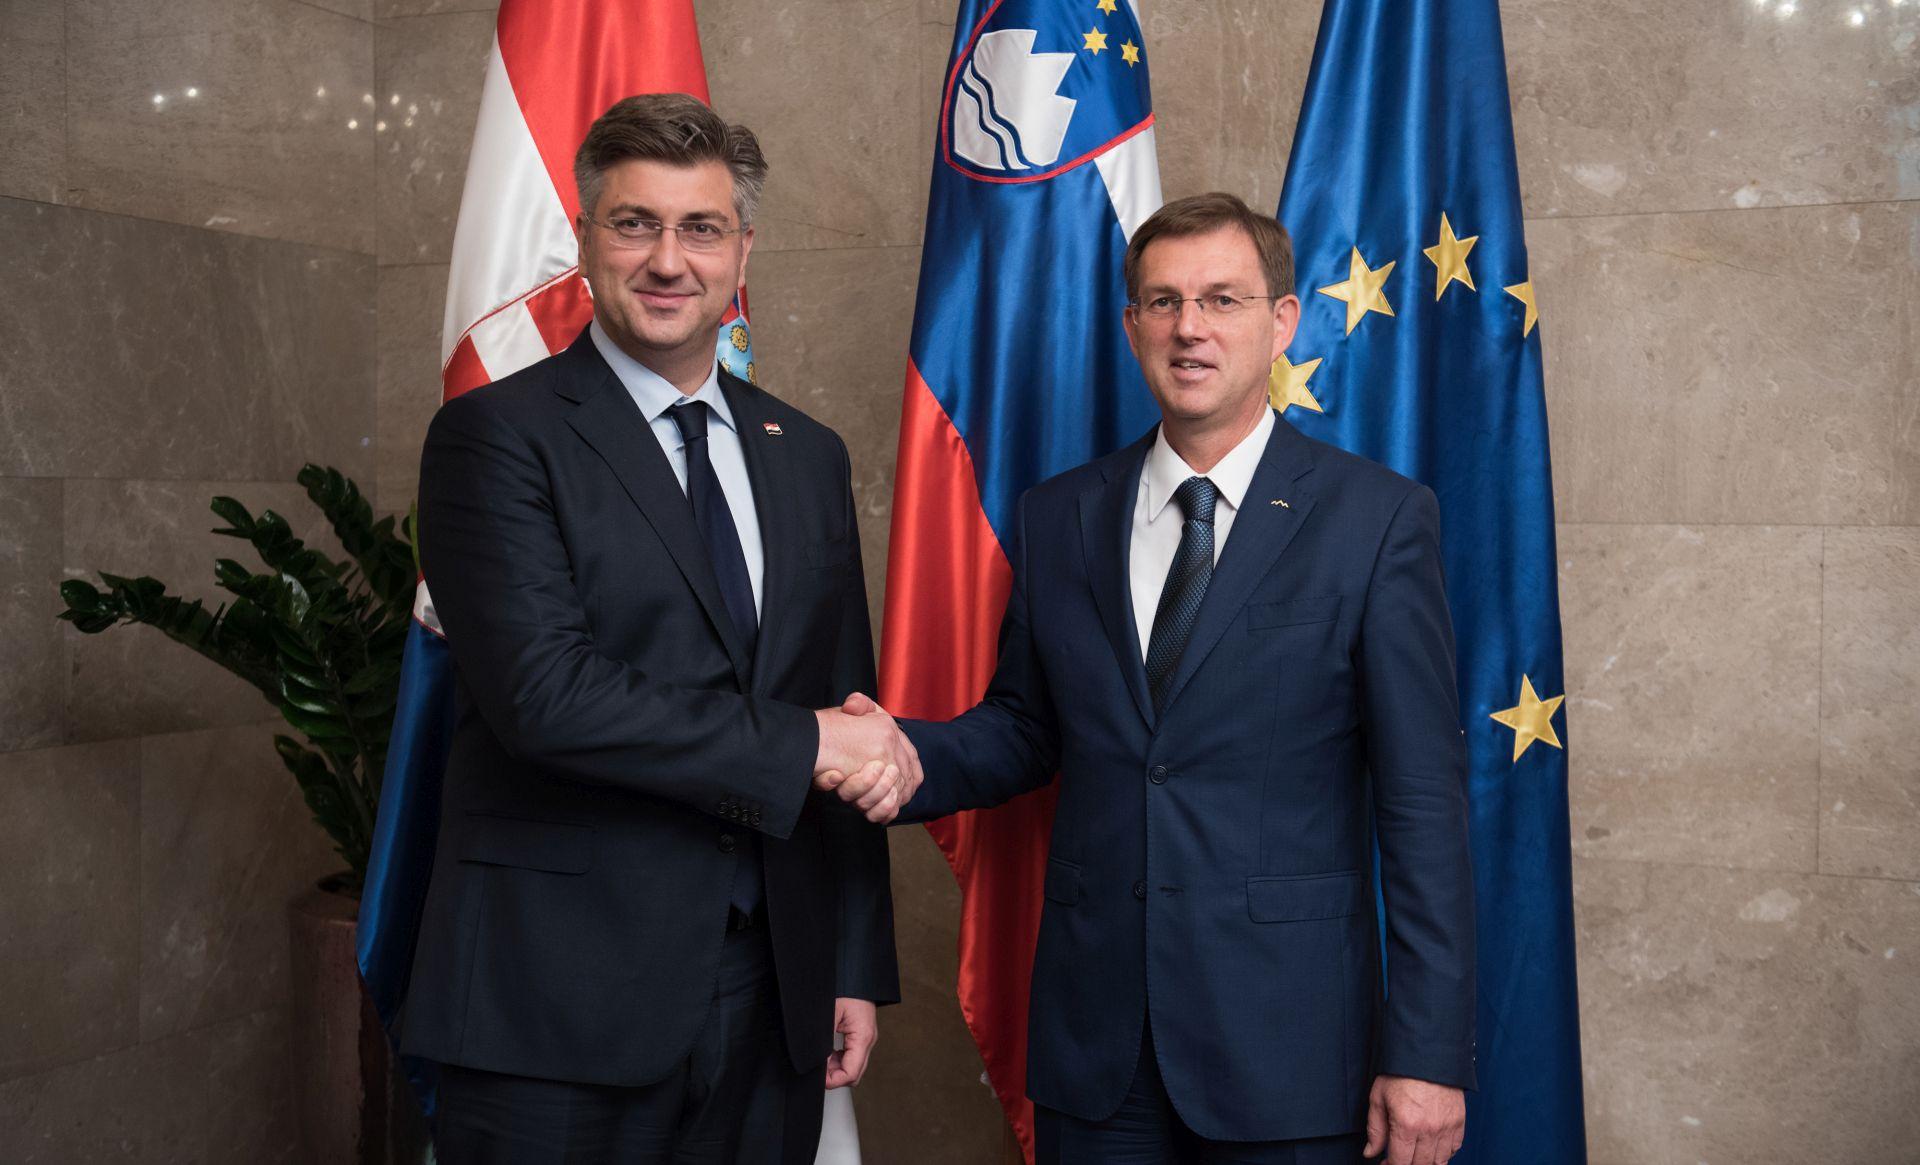 TALLIN Plenkoviću za razgovore s Cerarom ne treba posrednik